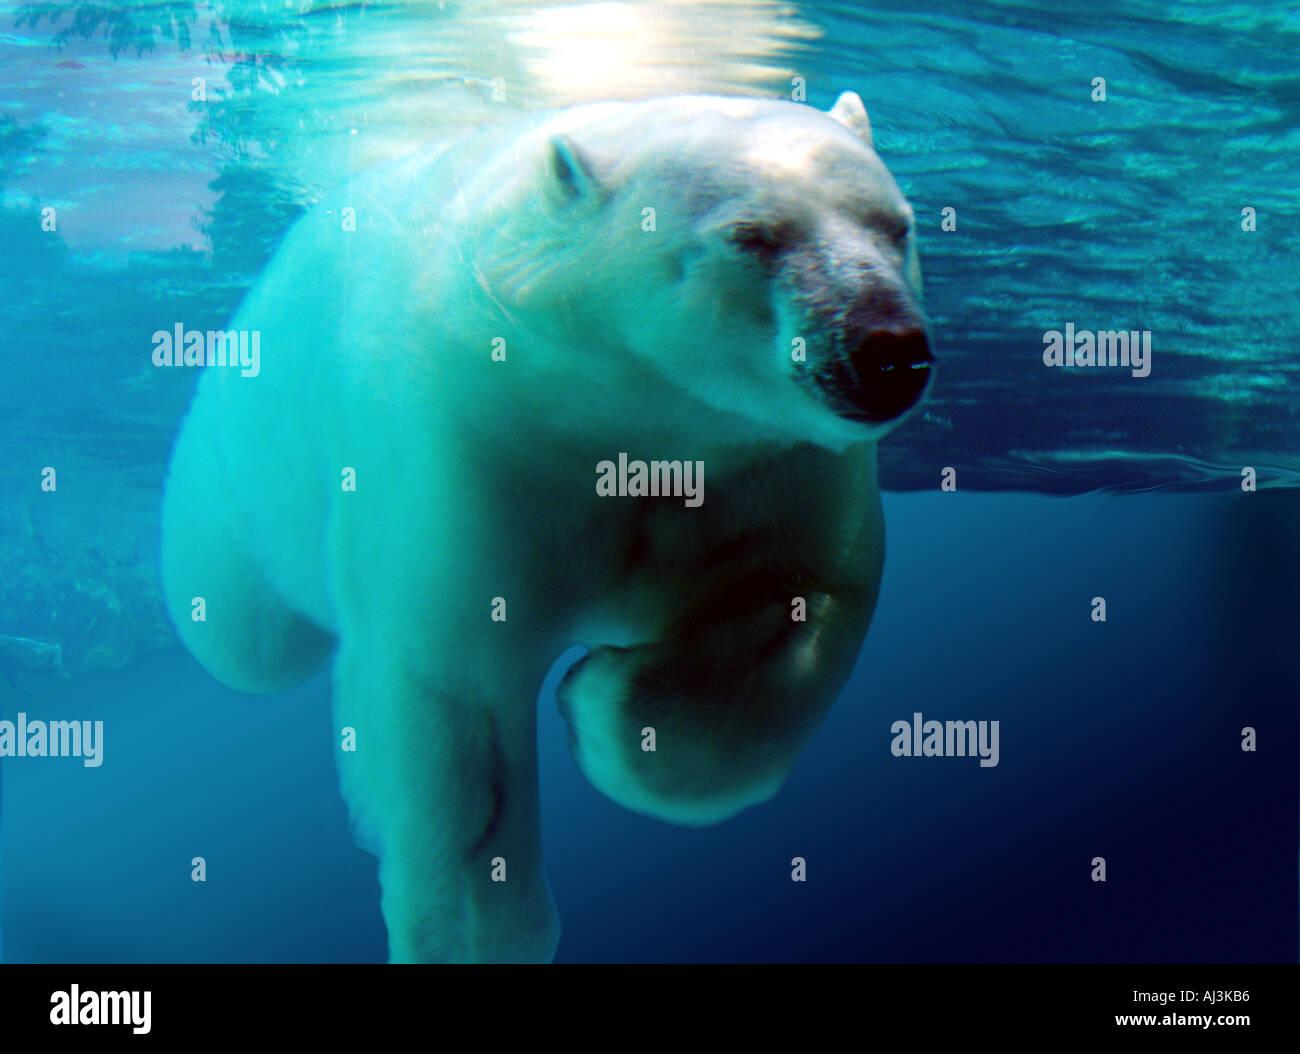 Polar bear swimming in ocean - photo#45